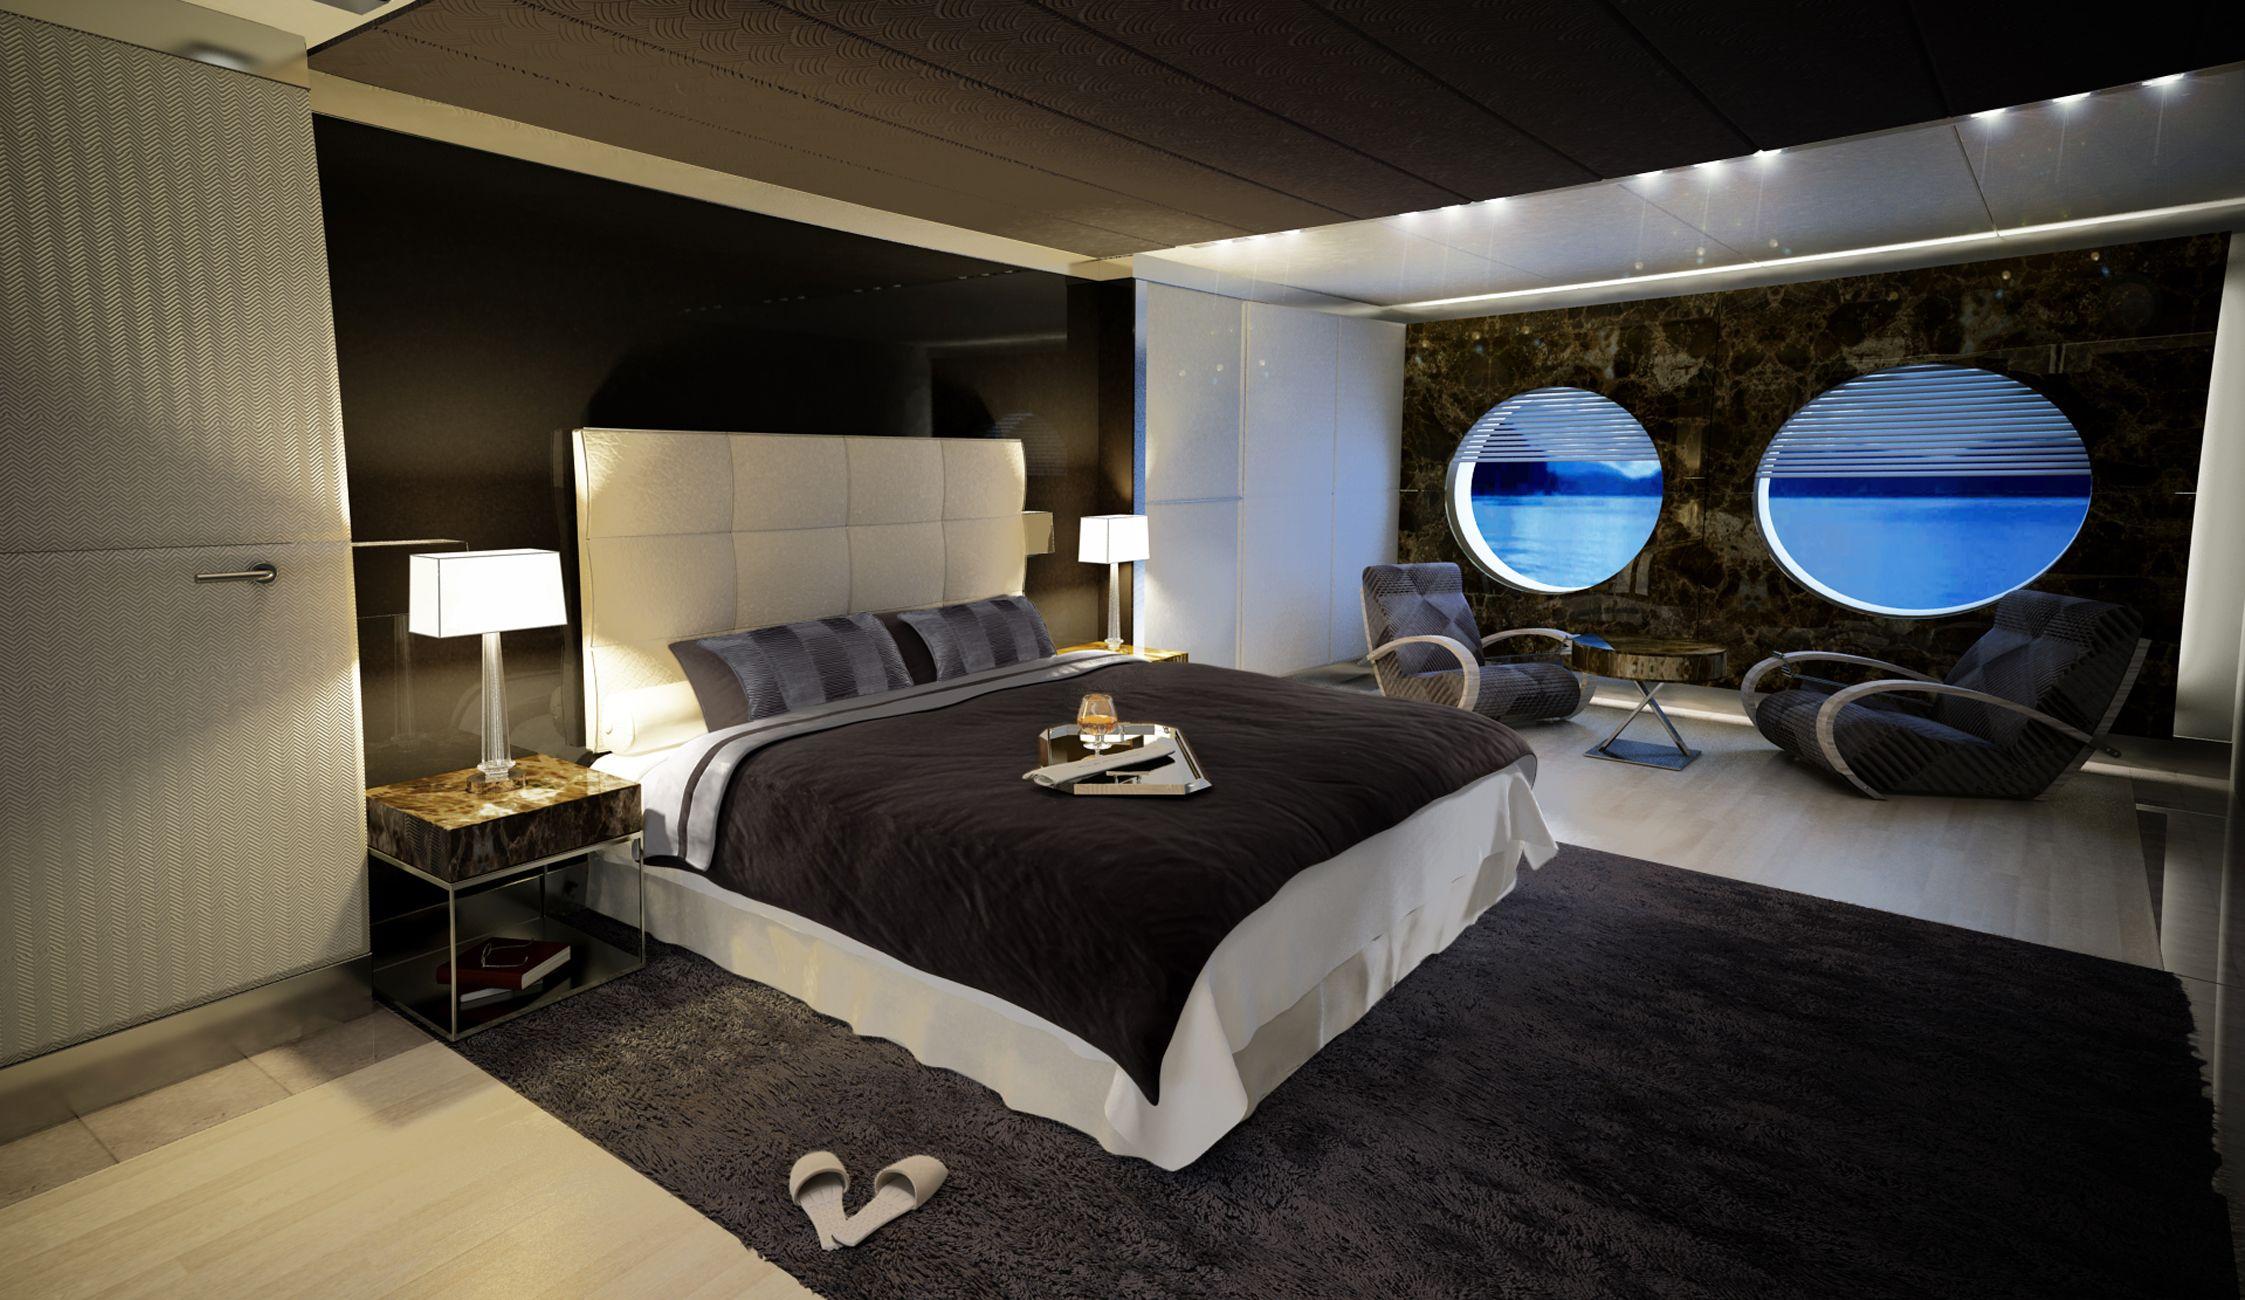 interior design for yachts - bing images | bedrooms | pinterest